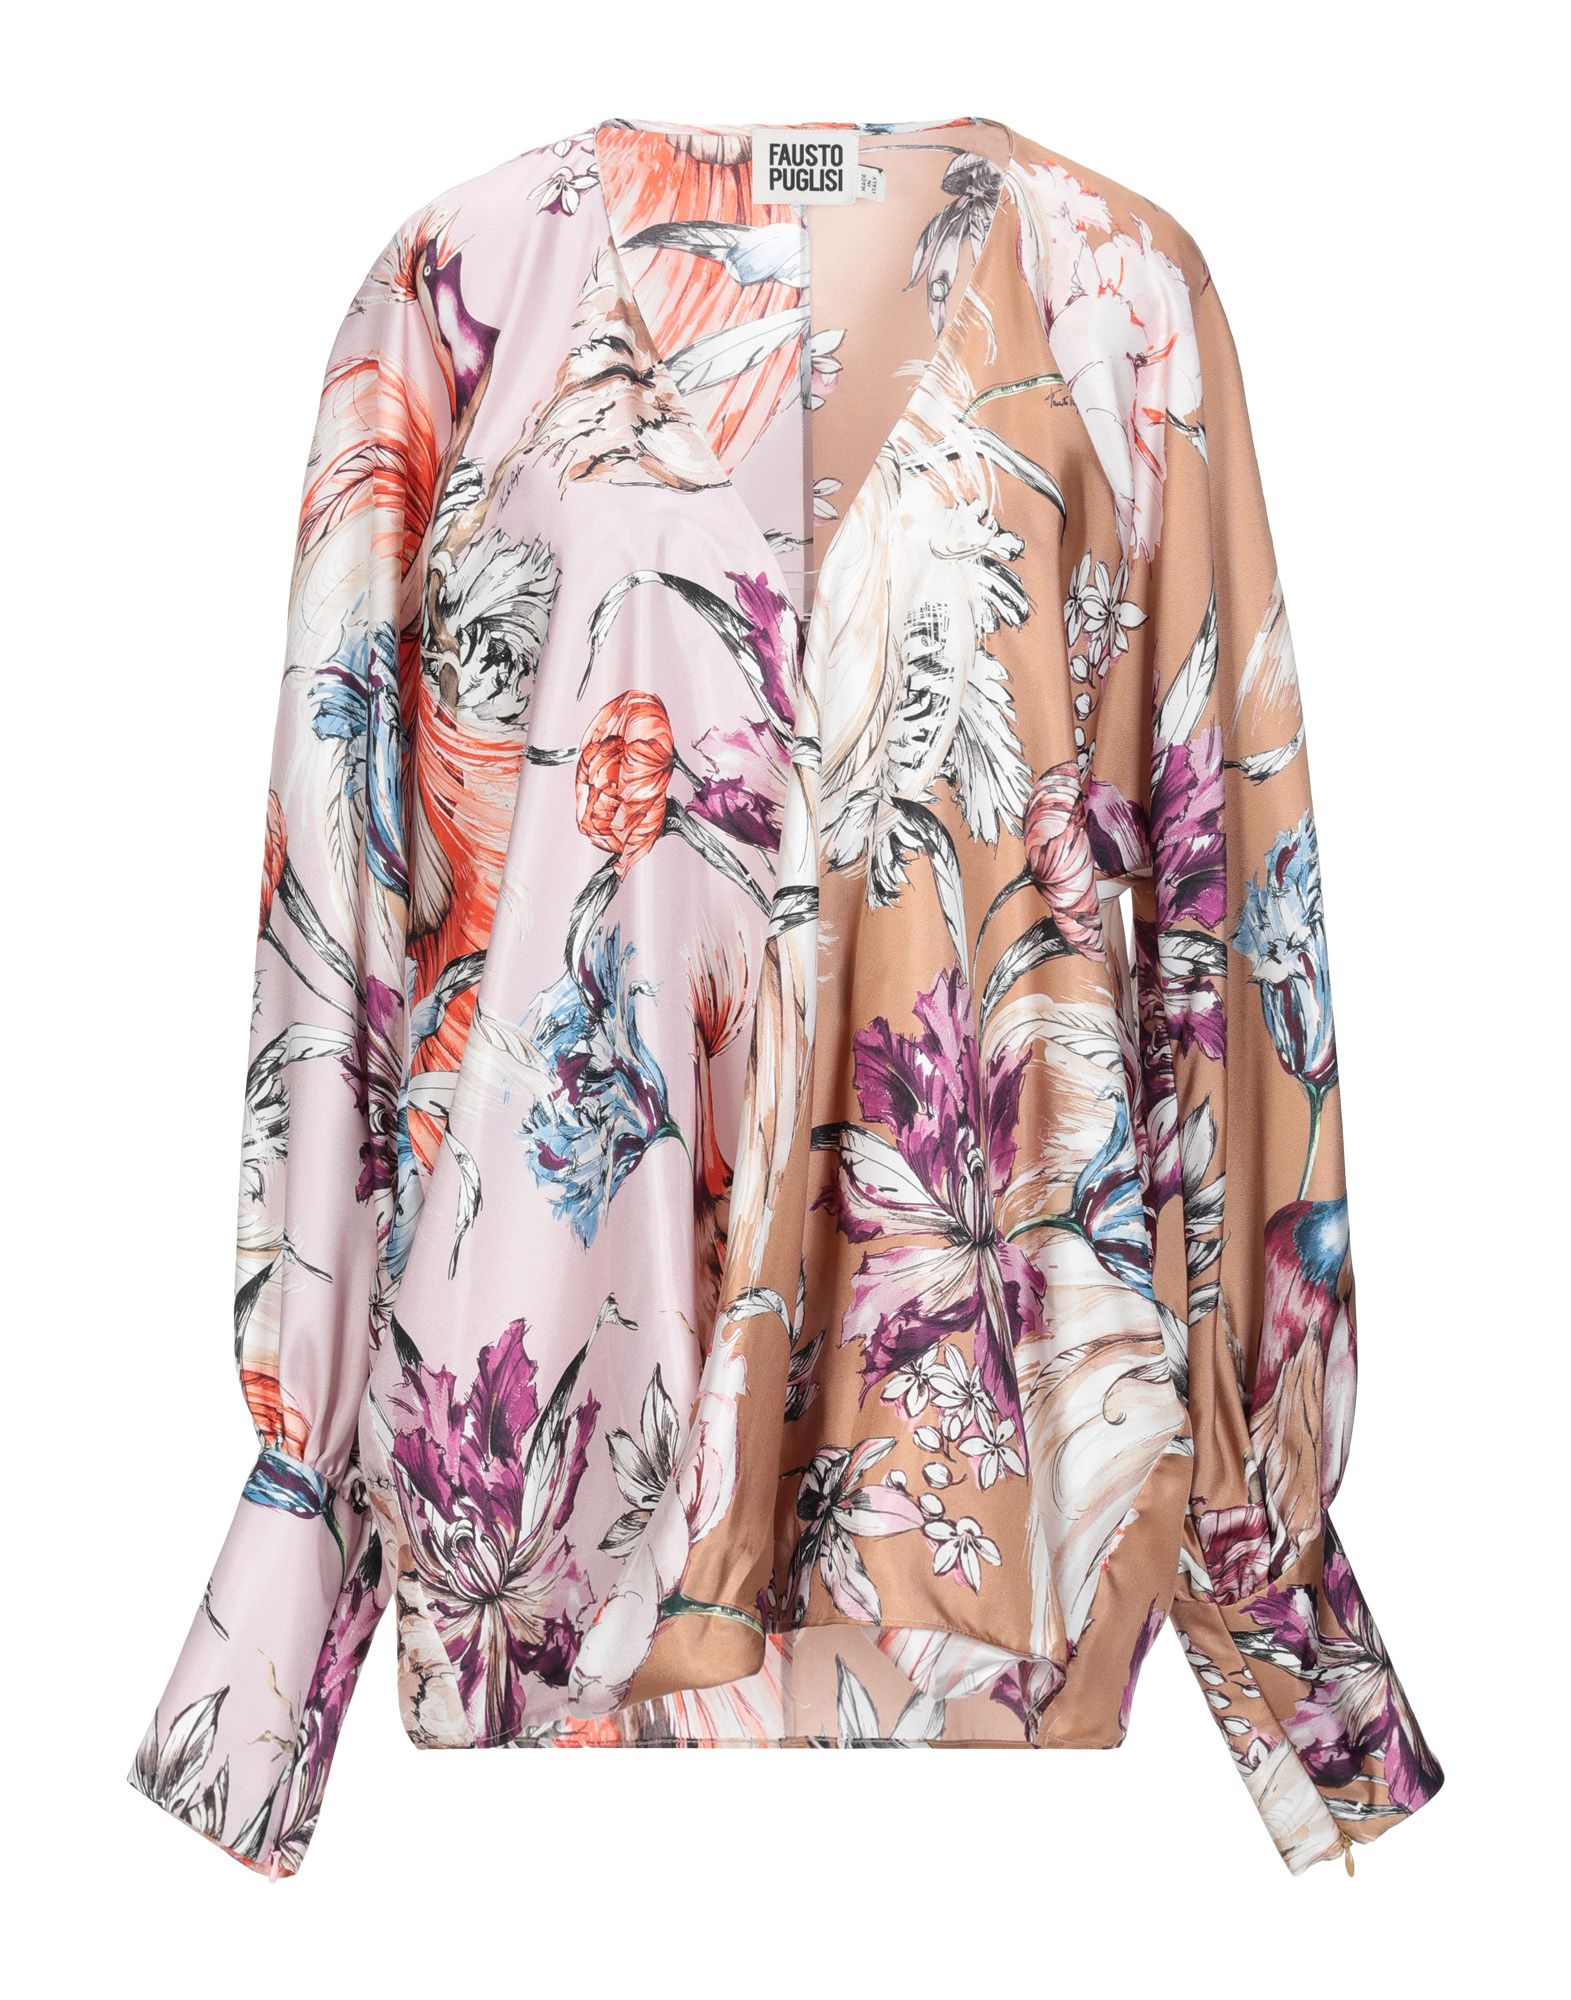 Фото - FAUSTO PUGLISI Блузка fausto puglisi блузка